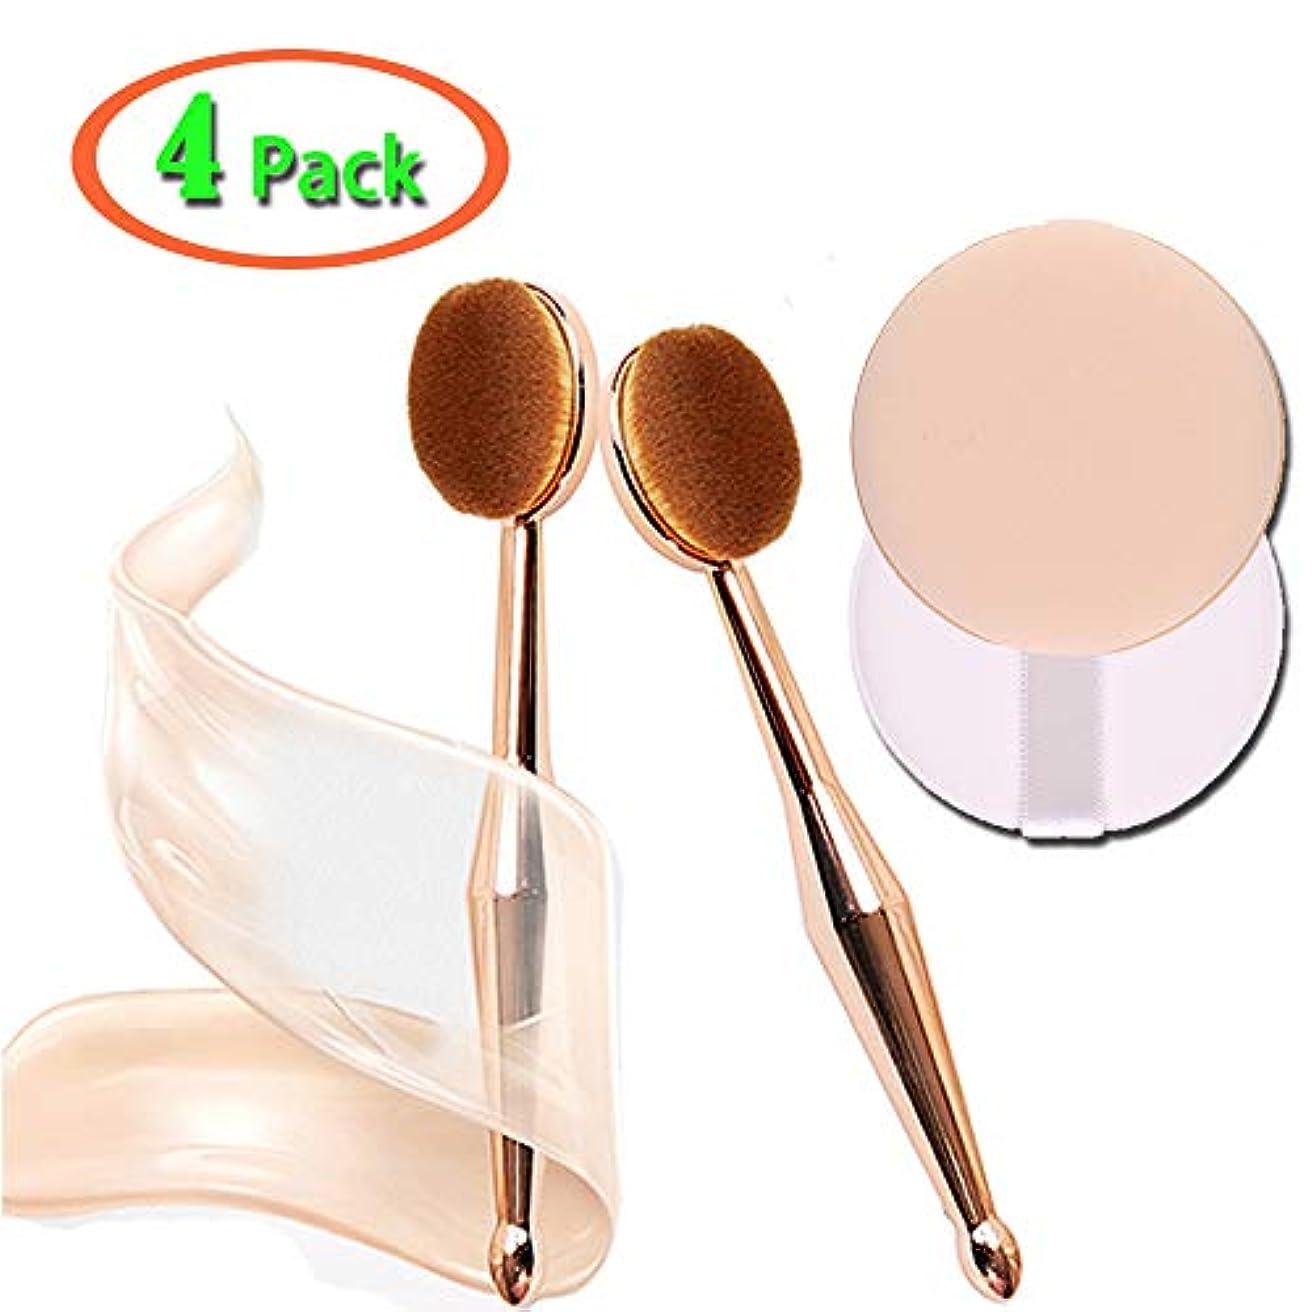 YuJiny 化粧ブラシ 歯ブラシ型 高級繊維毛 ファンデーションブラシ メイクブラシ メイクアップブラシ 肌に優しいパフ 化粧 ファンデーションブラシ 2ペア ゴールド